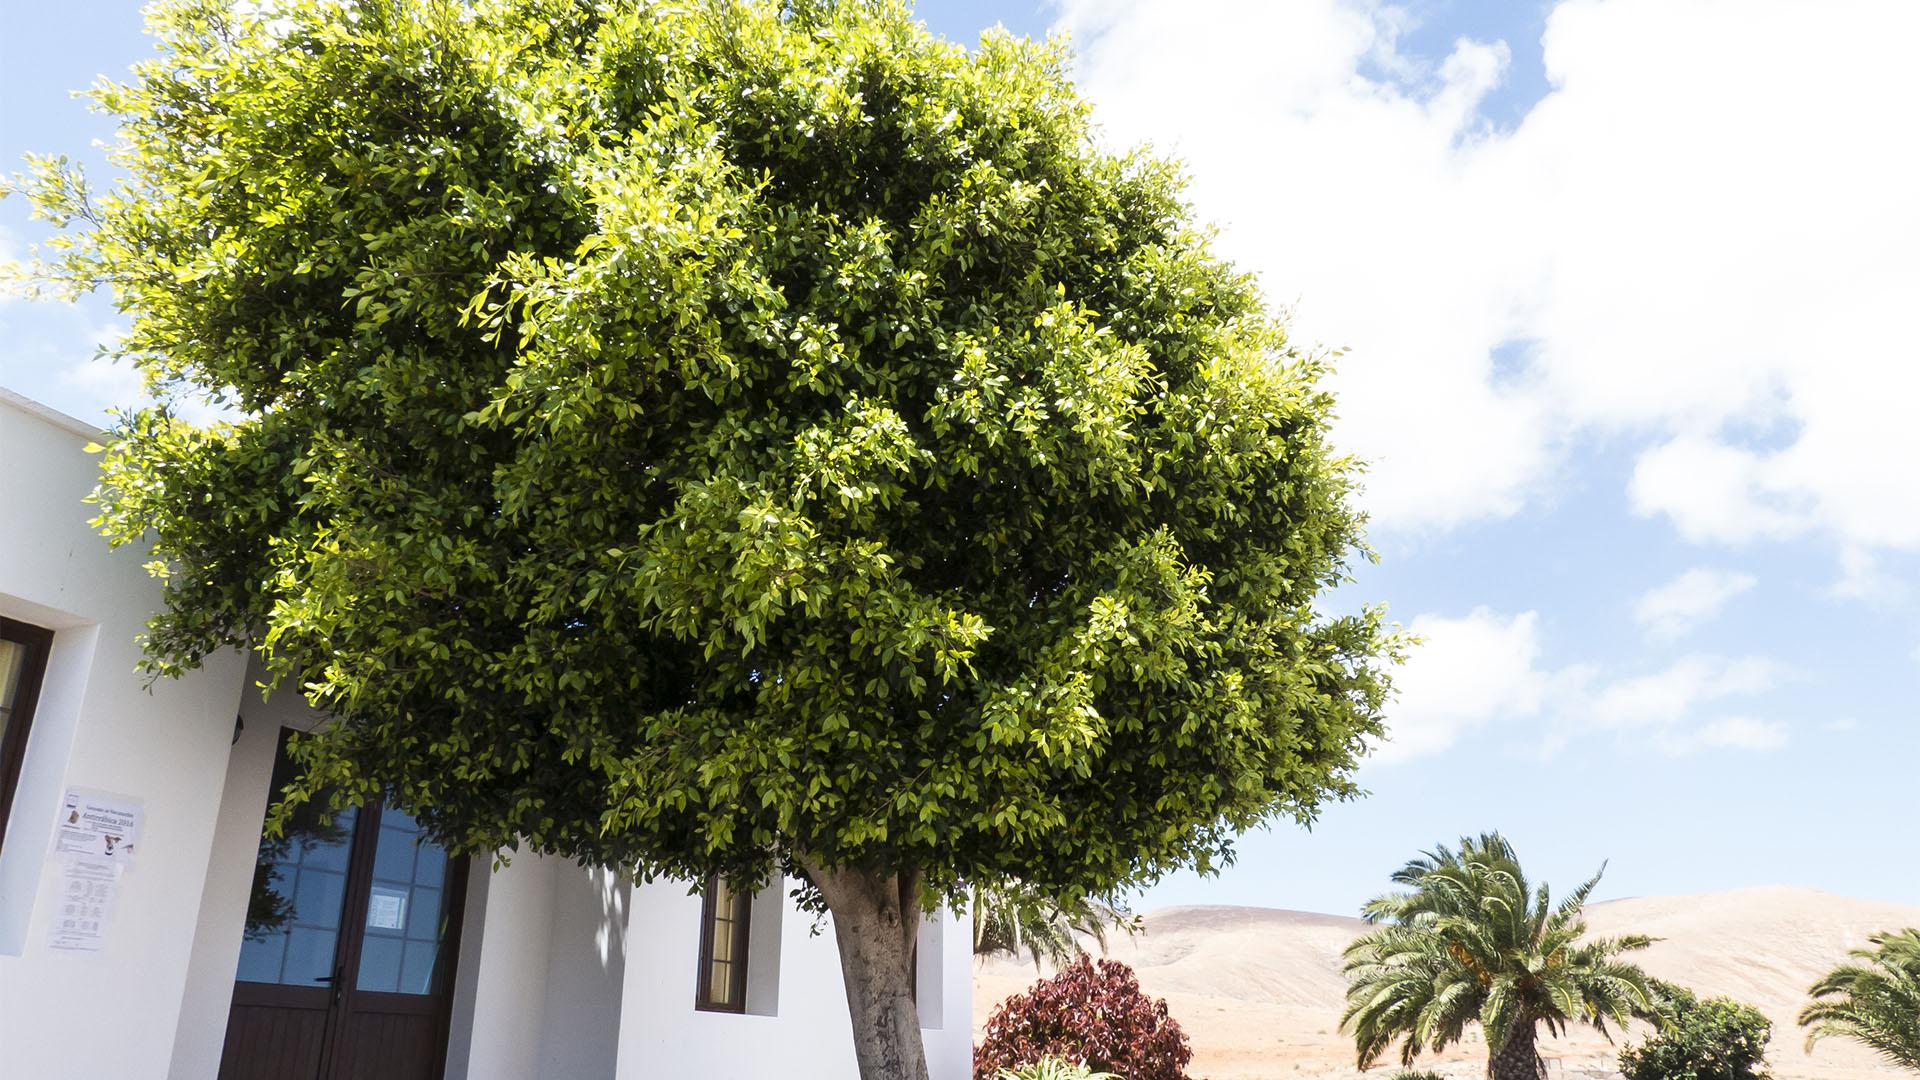 Der Ort Valle de Santa Inés Fuerteventura.